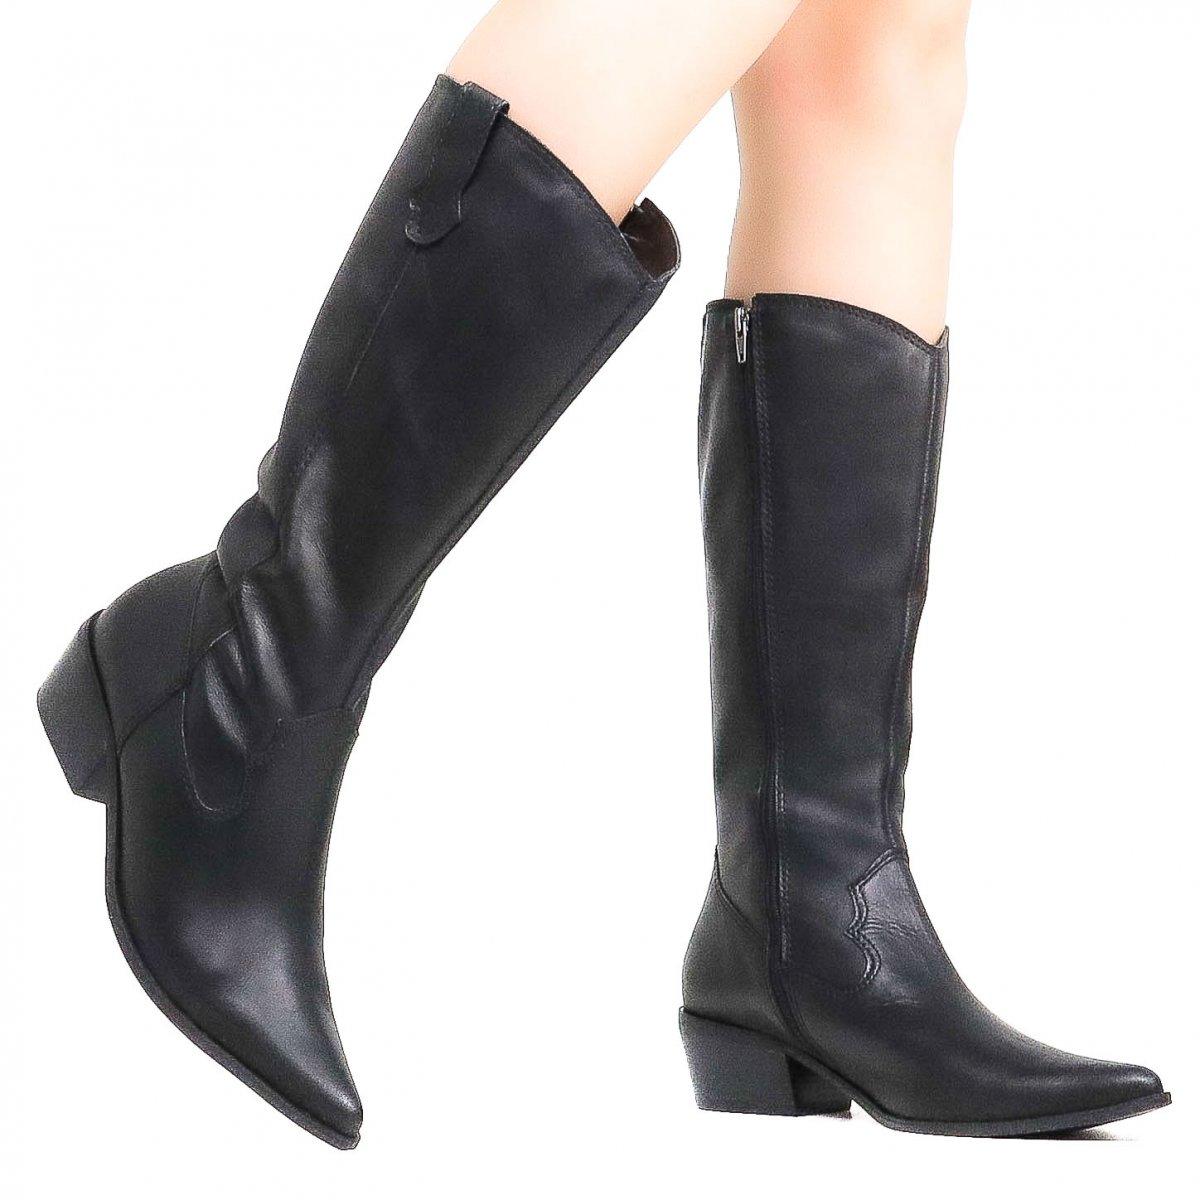 cabf4bb73f0 Bota Zariff Shoes Montaria Couro Western